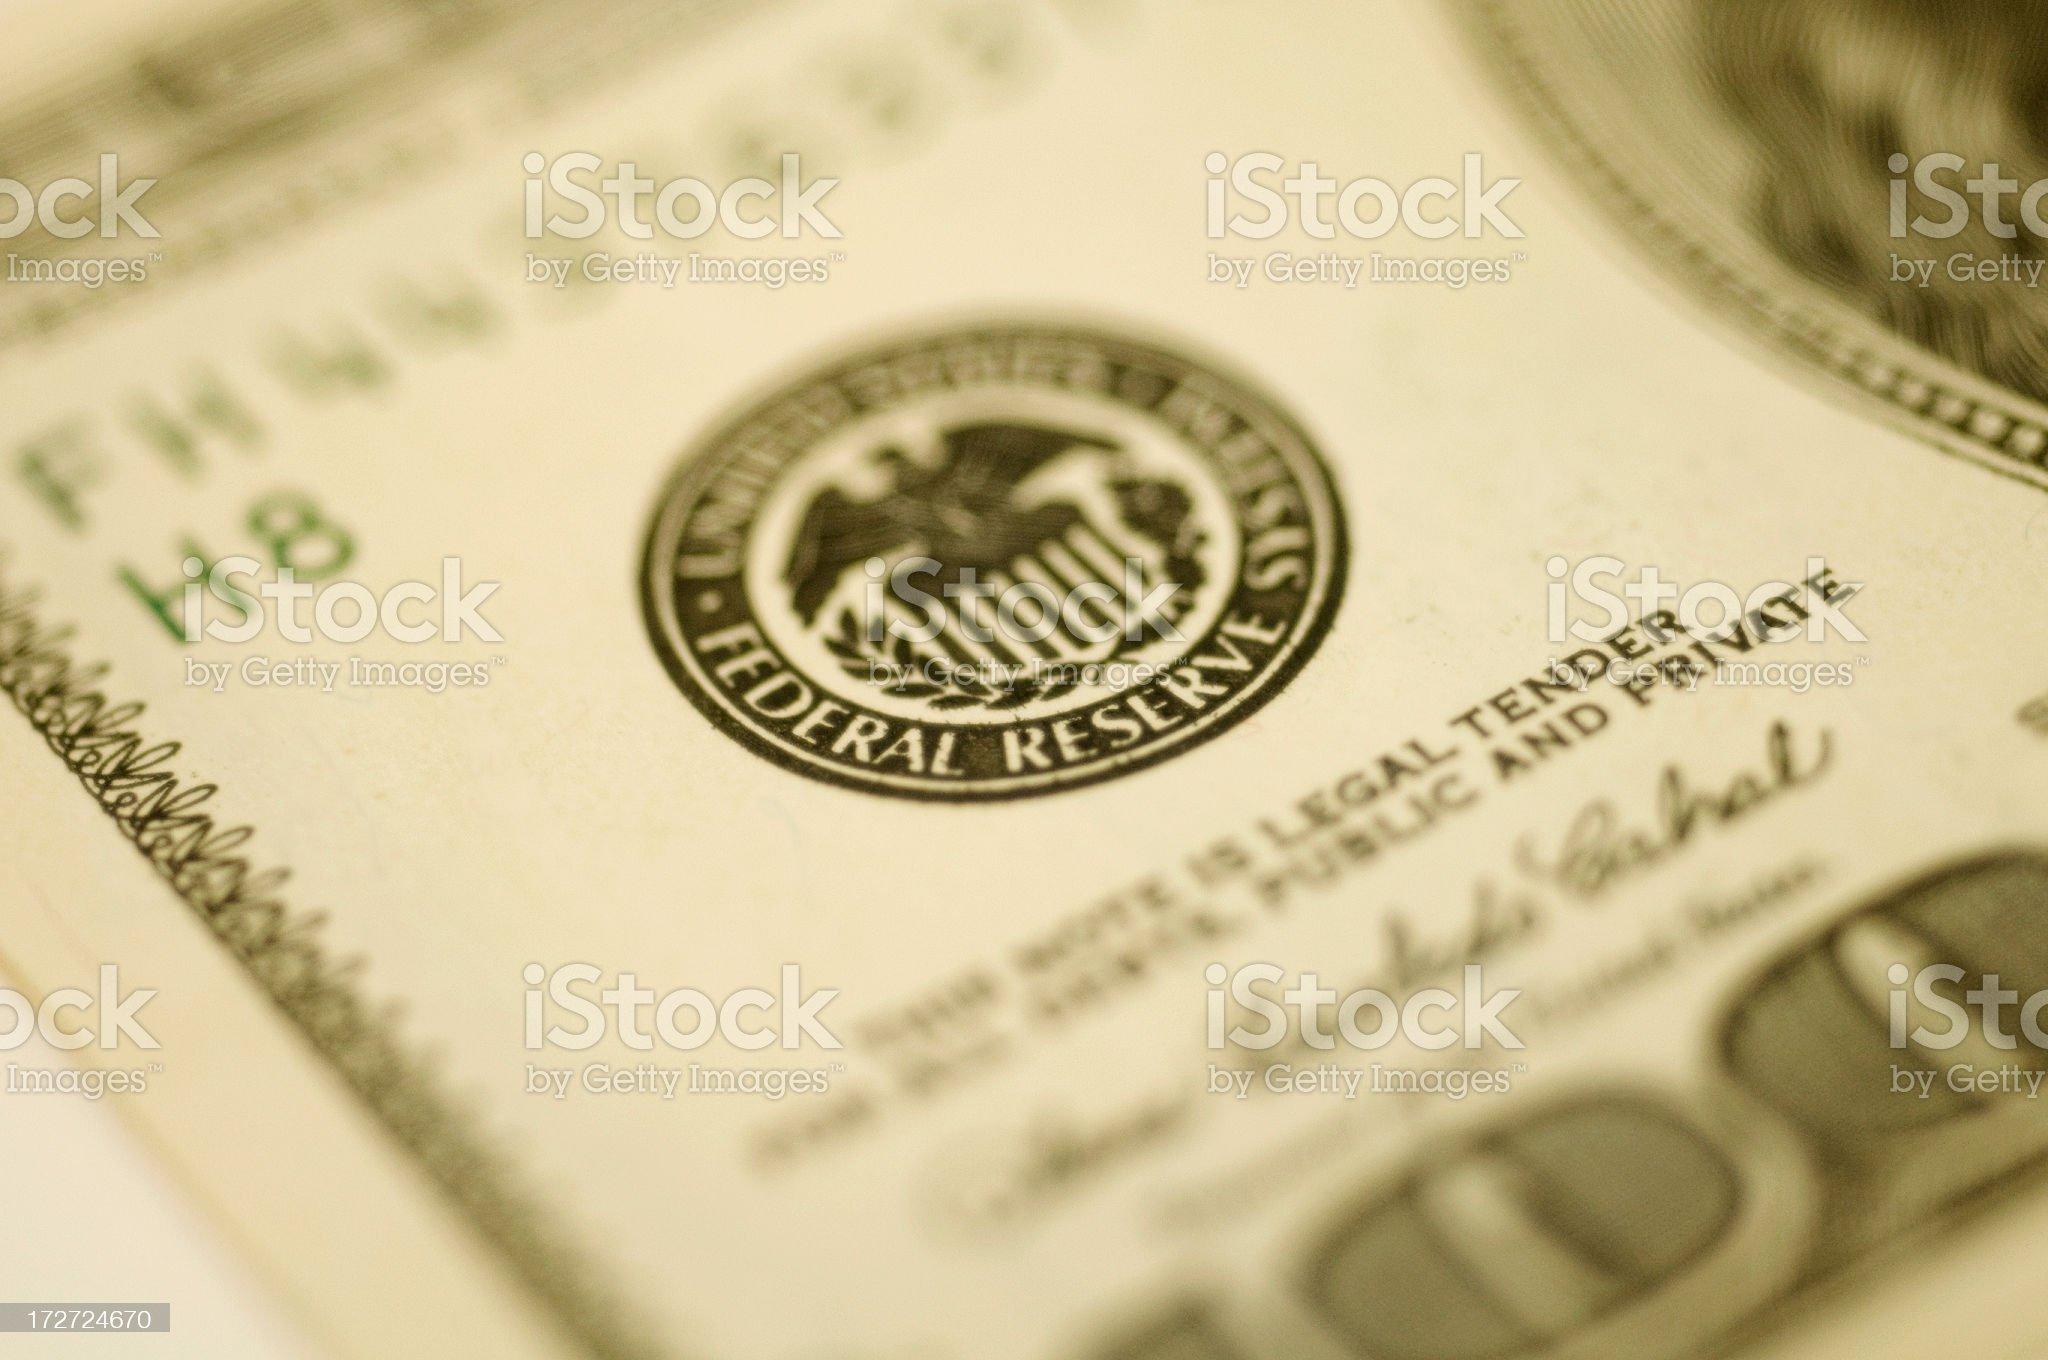 American $100 bill, close-up royalty-free stock photo